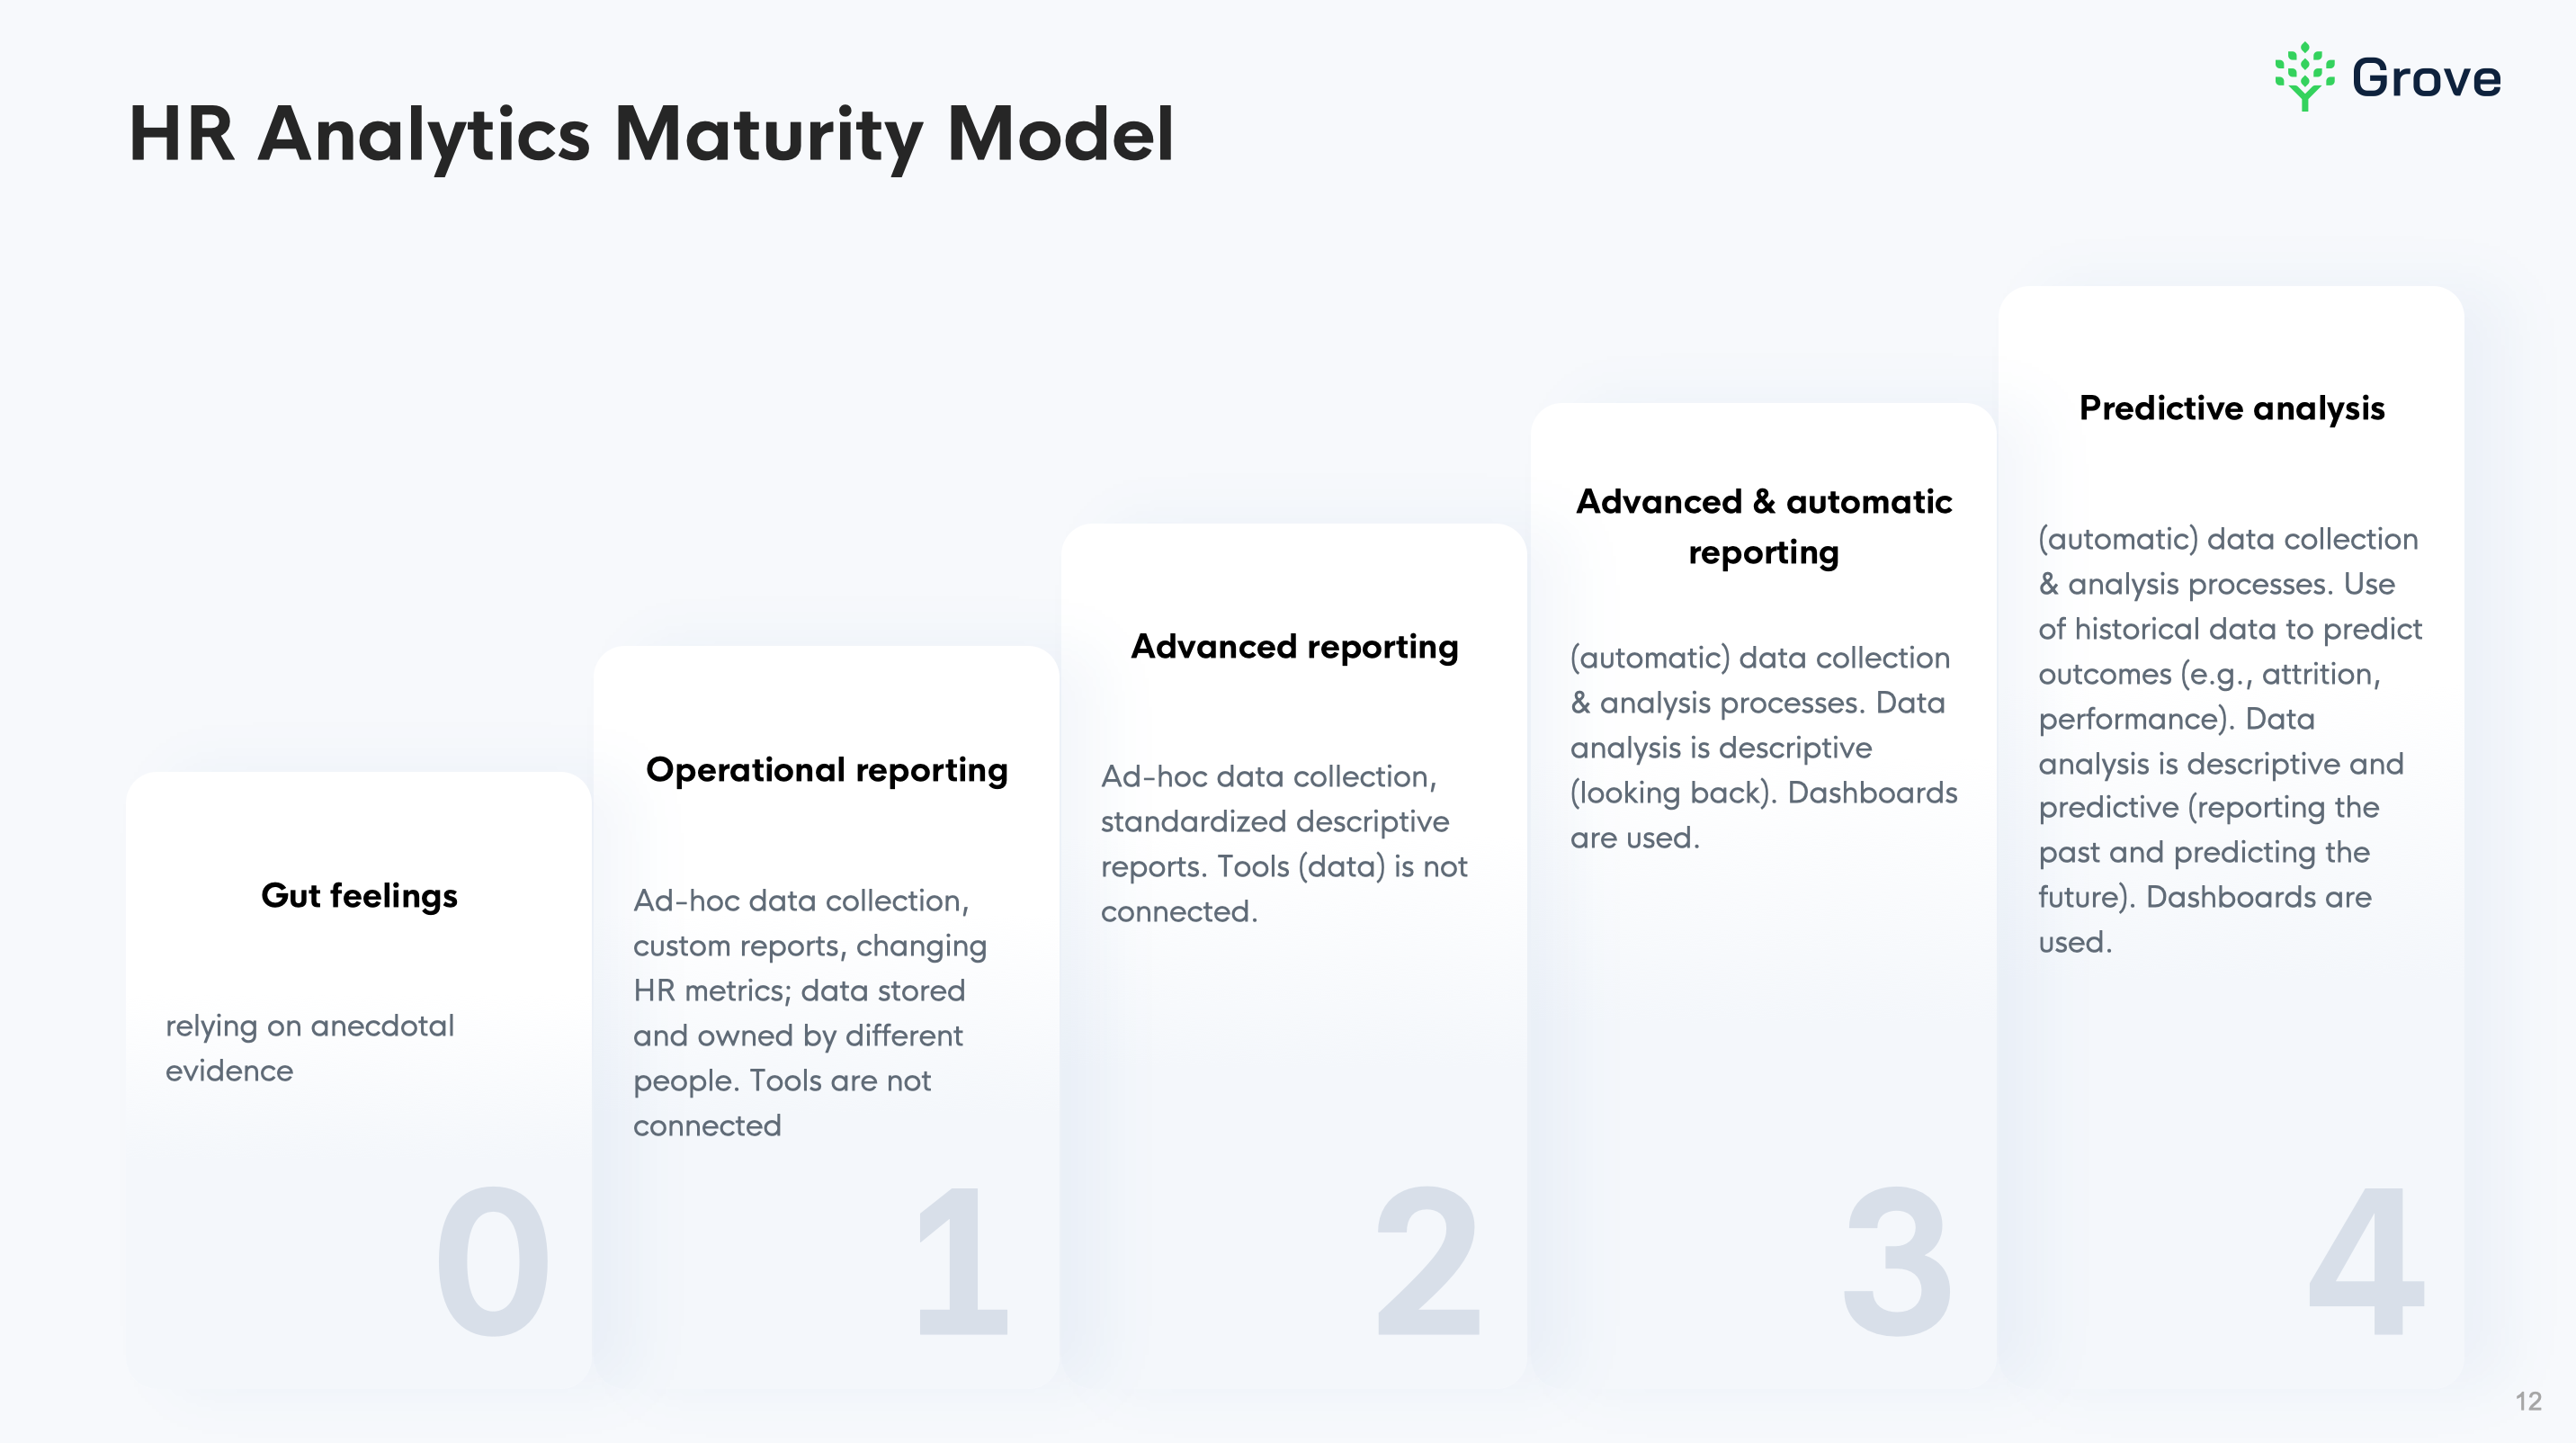 HR analytics maturity model